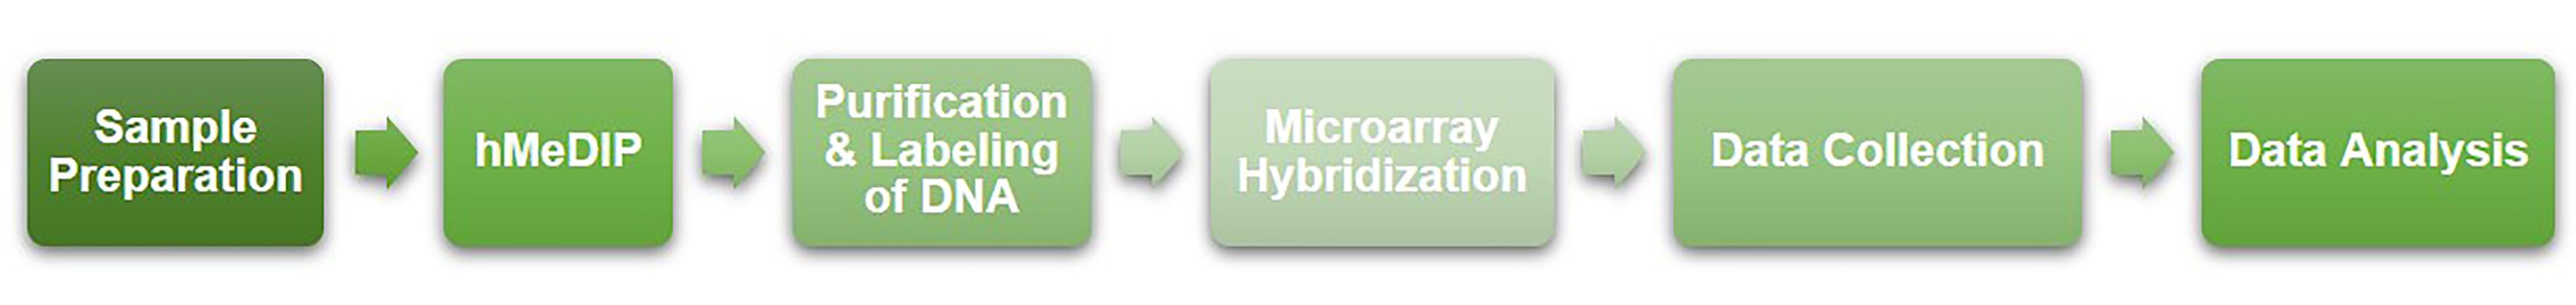 Workflow of hMeDIP-chip service at Creative BioMart